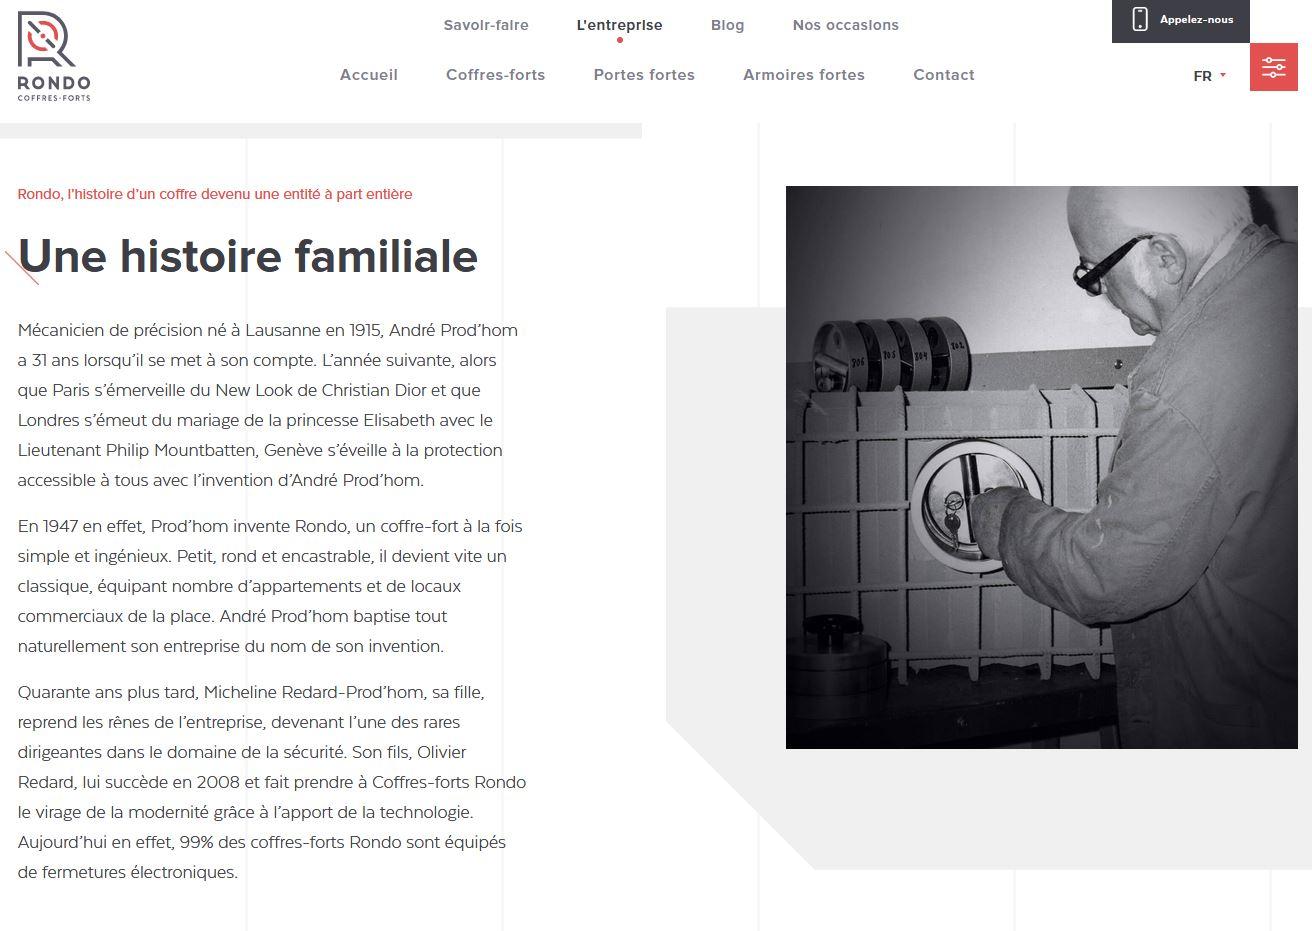 Services - Coffres-forts Rondo - Site internet - Histoire